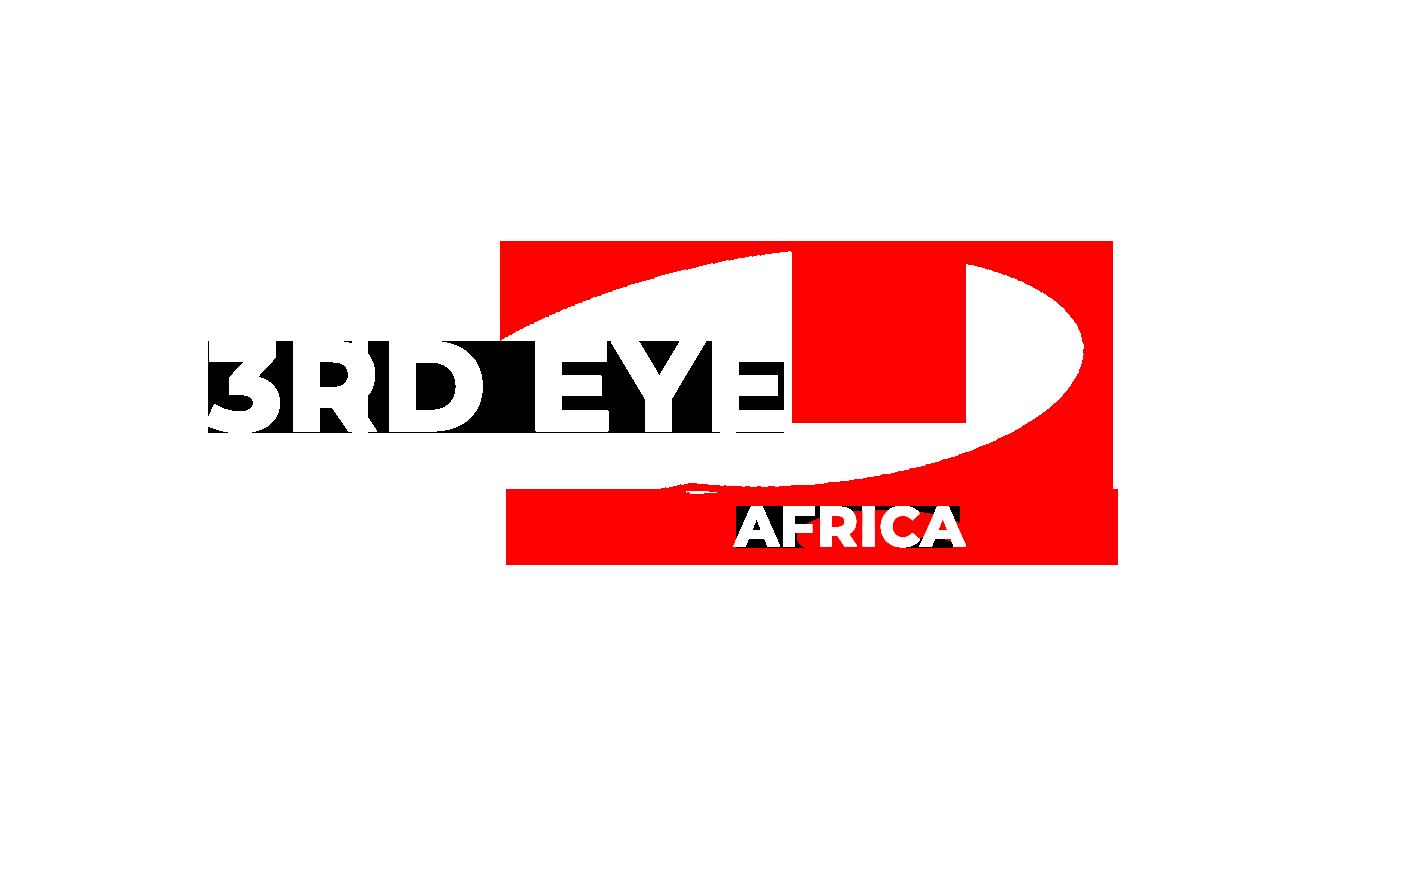 3rd Eye Africa